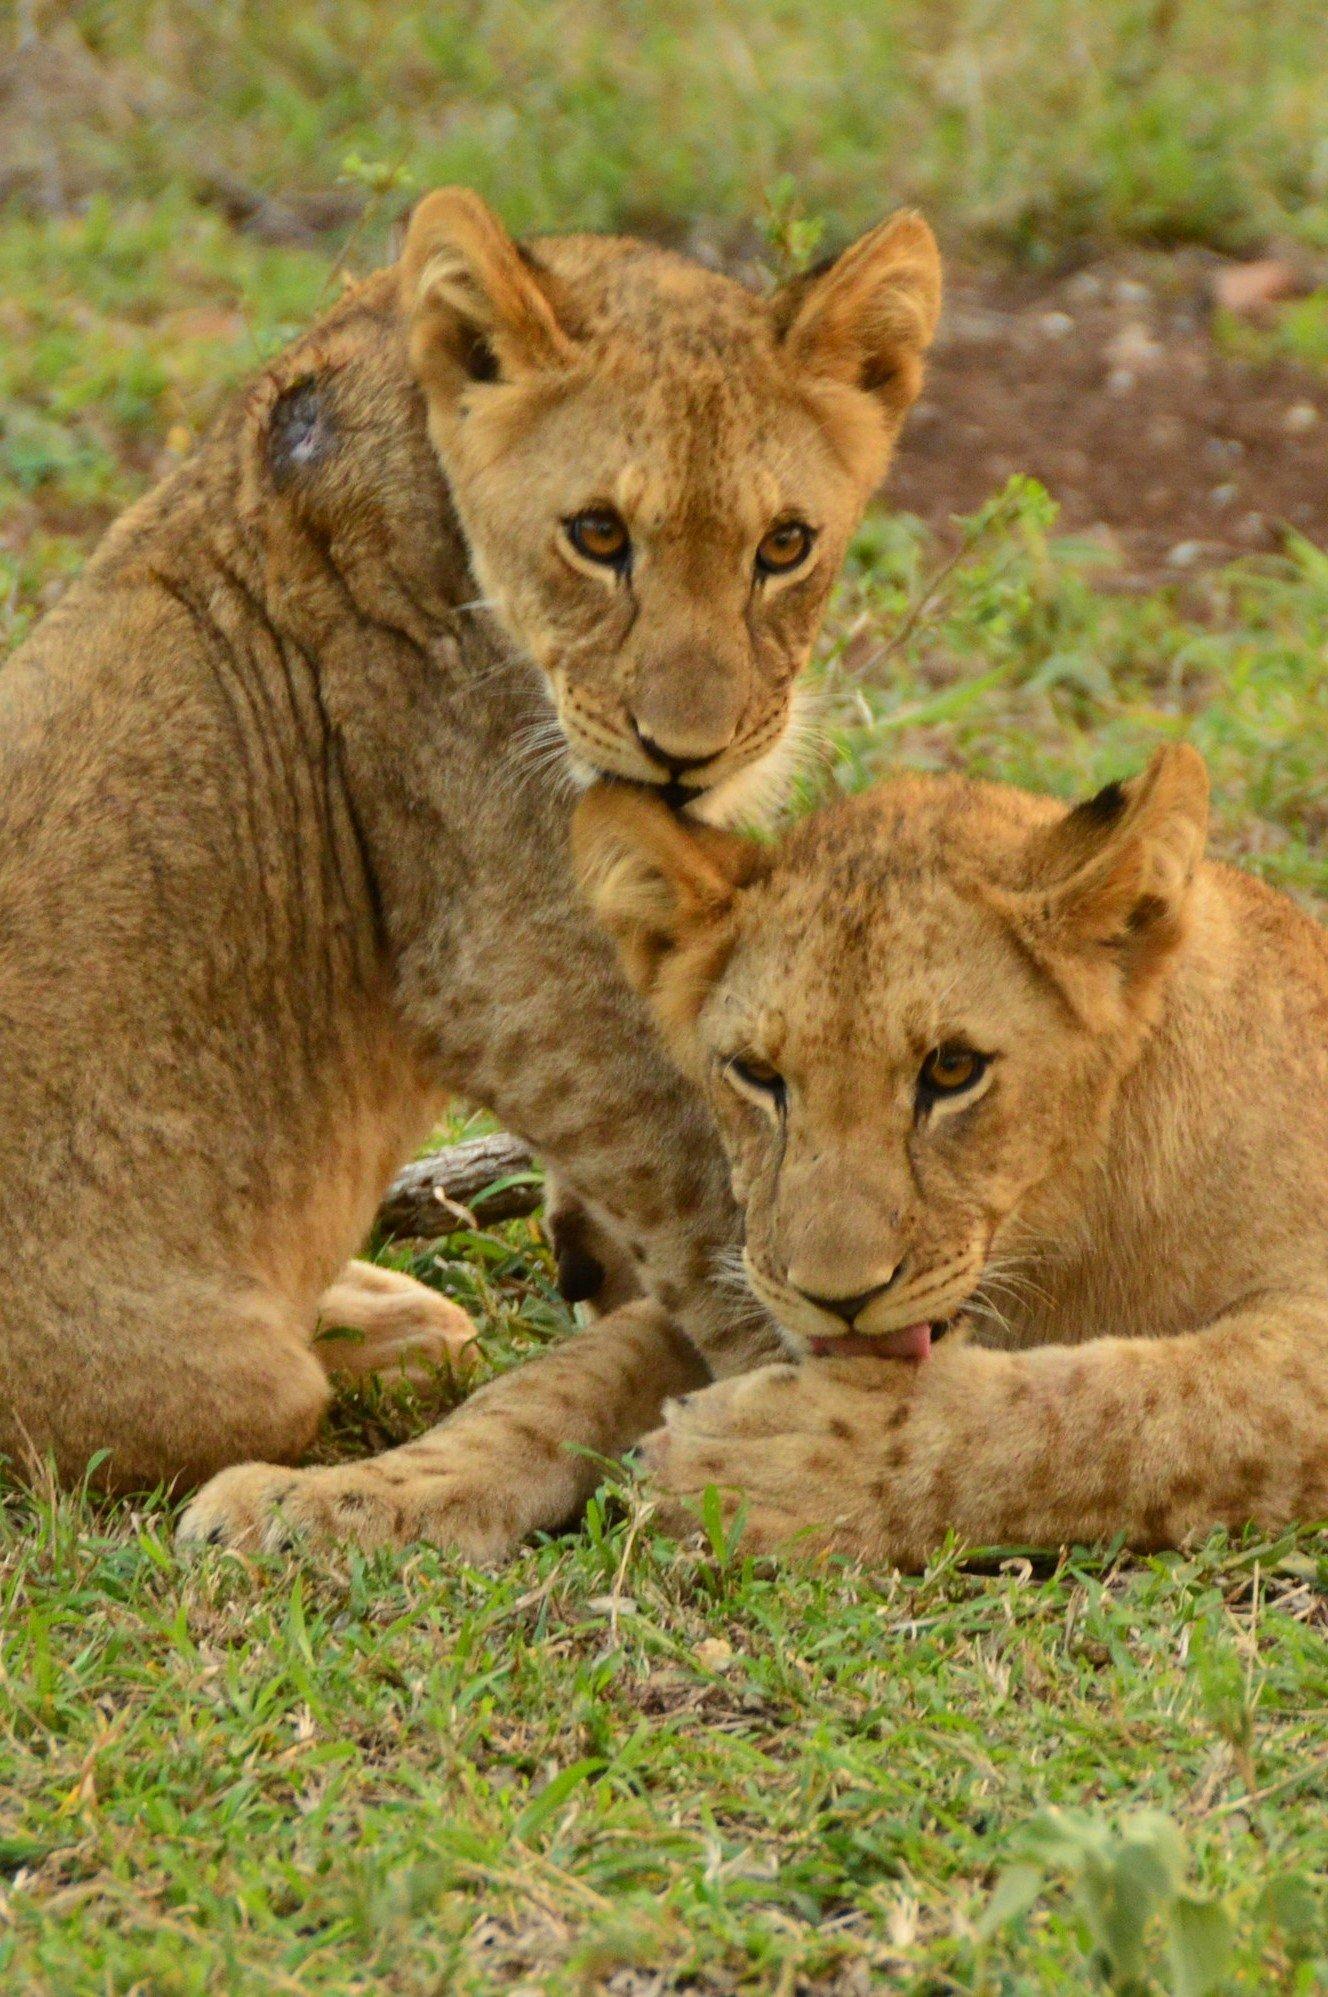 Lion in Thanda Game Reserve South Africa Photo Amanda O'Brien